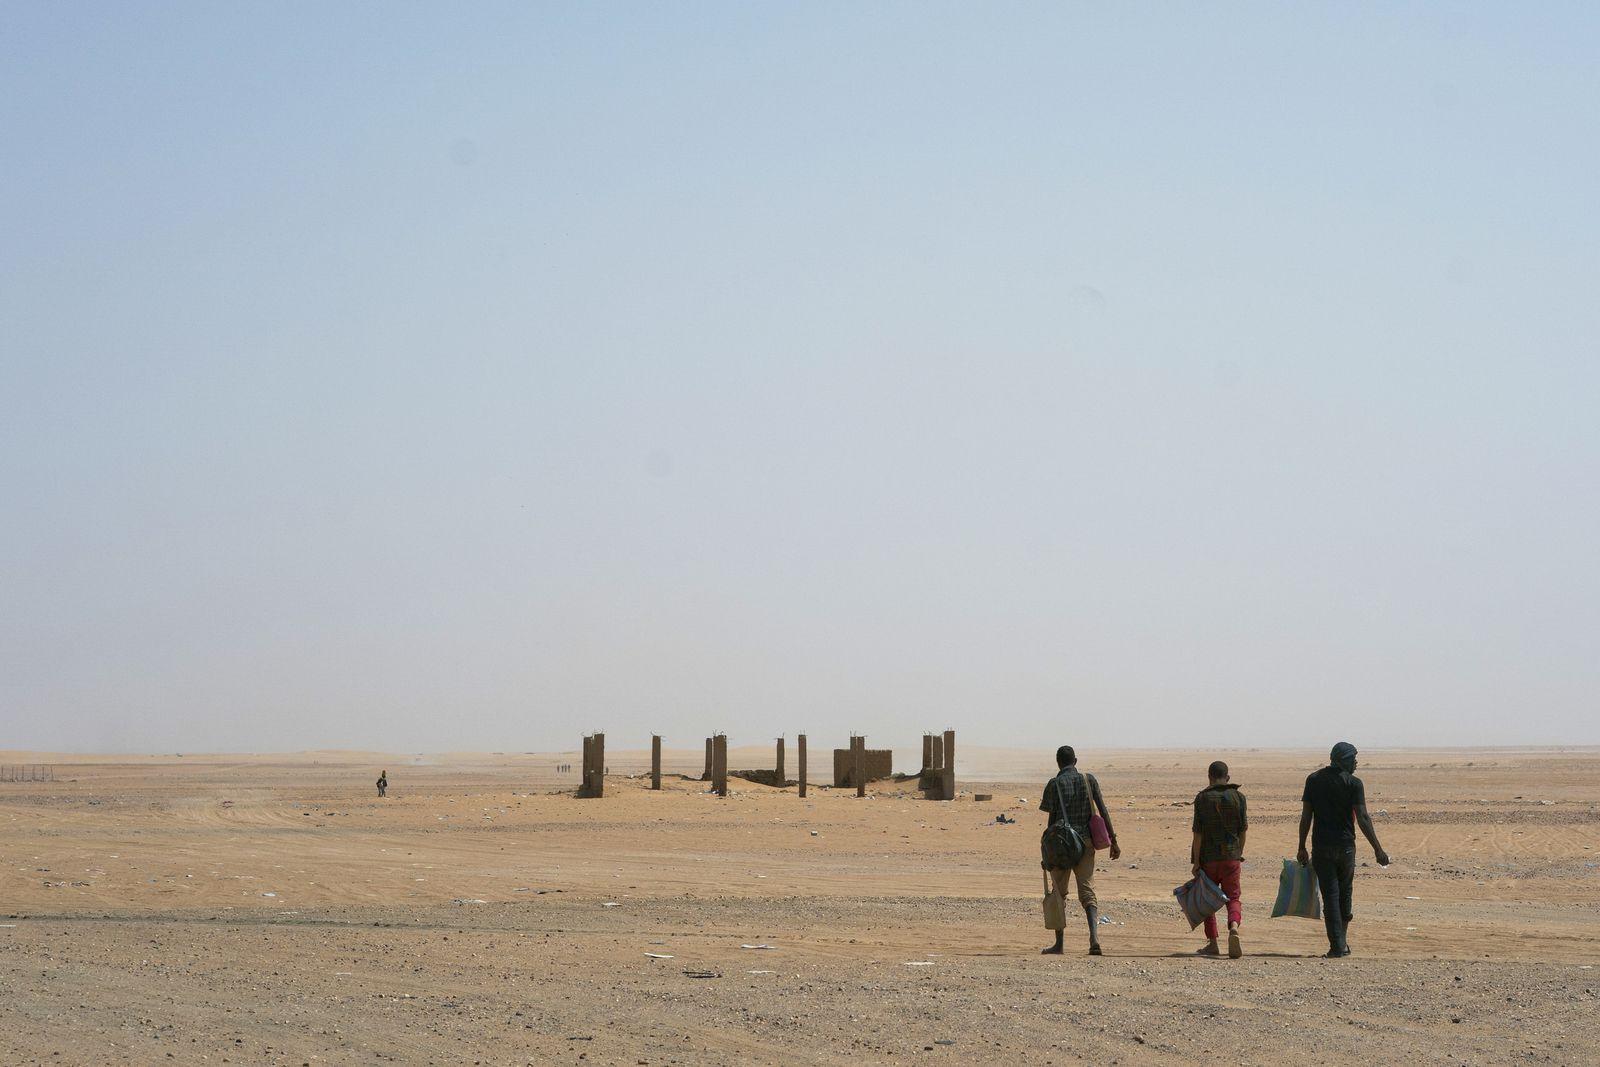 Sahara / Migranten